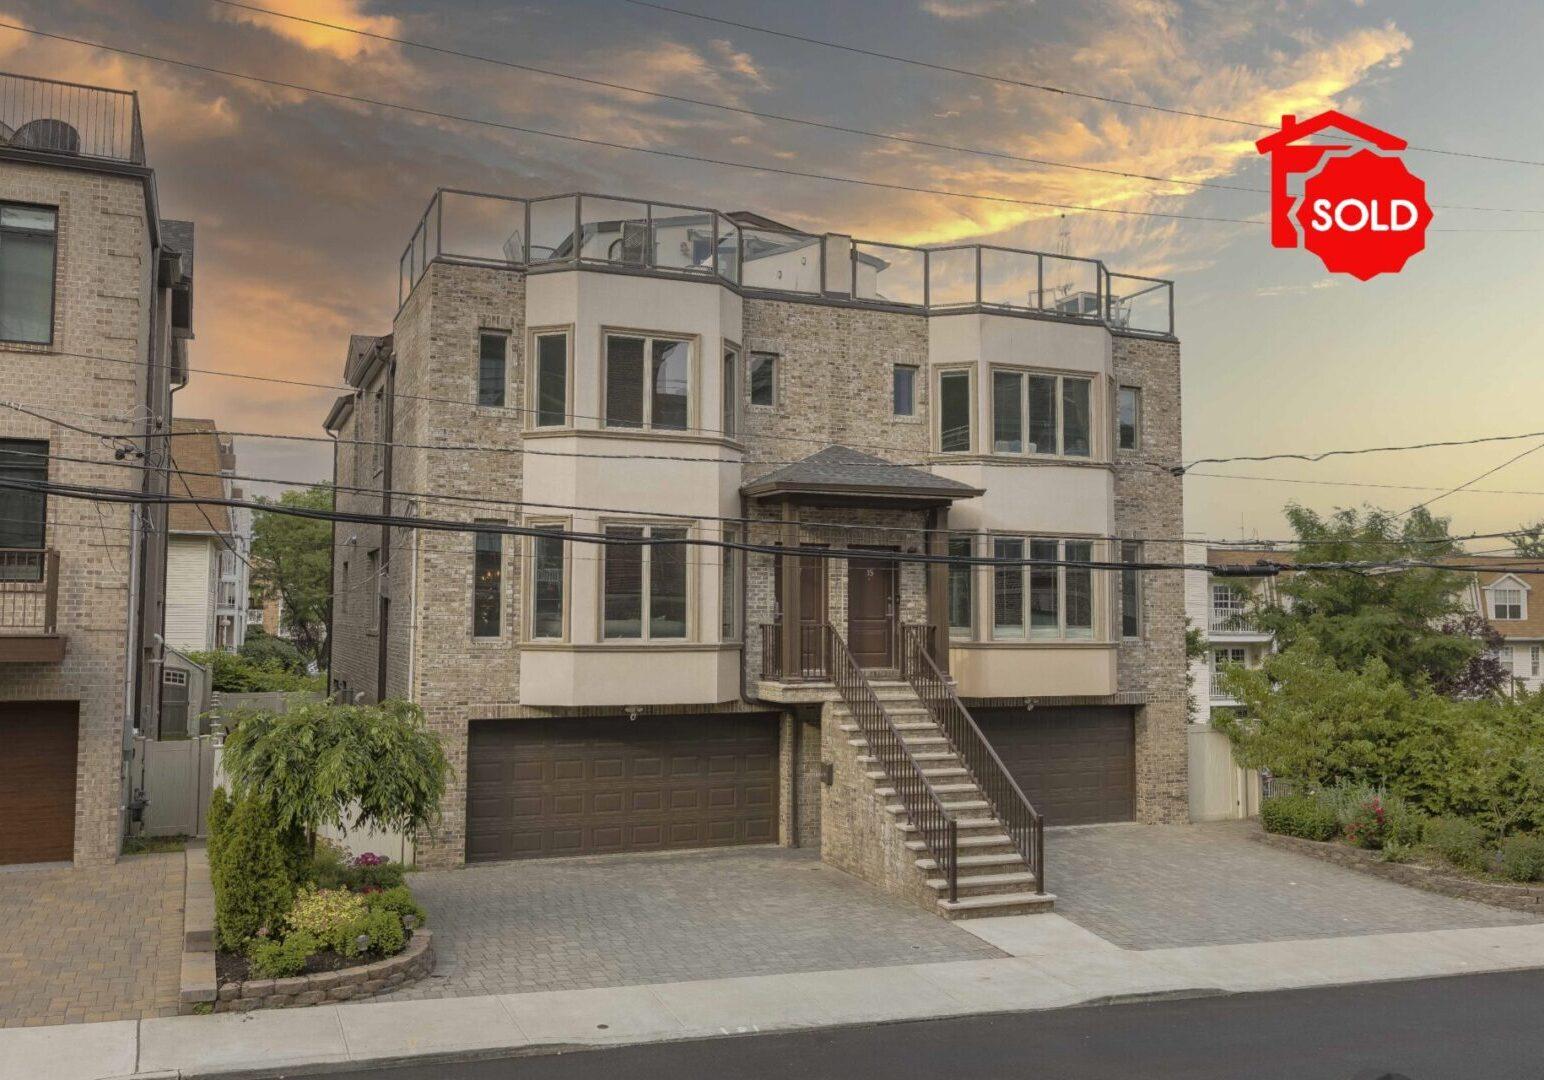 SOLD - 17 Winterburn Place Edgewater, NJ 07020 <br><br> $1,149,000  - Beds: 3 -  Baths: 3 - Half Baths: 1